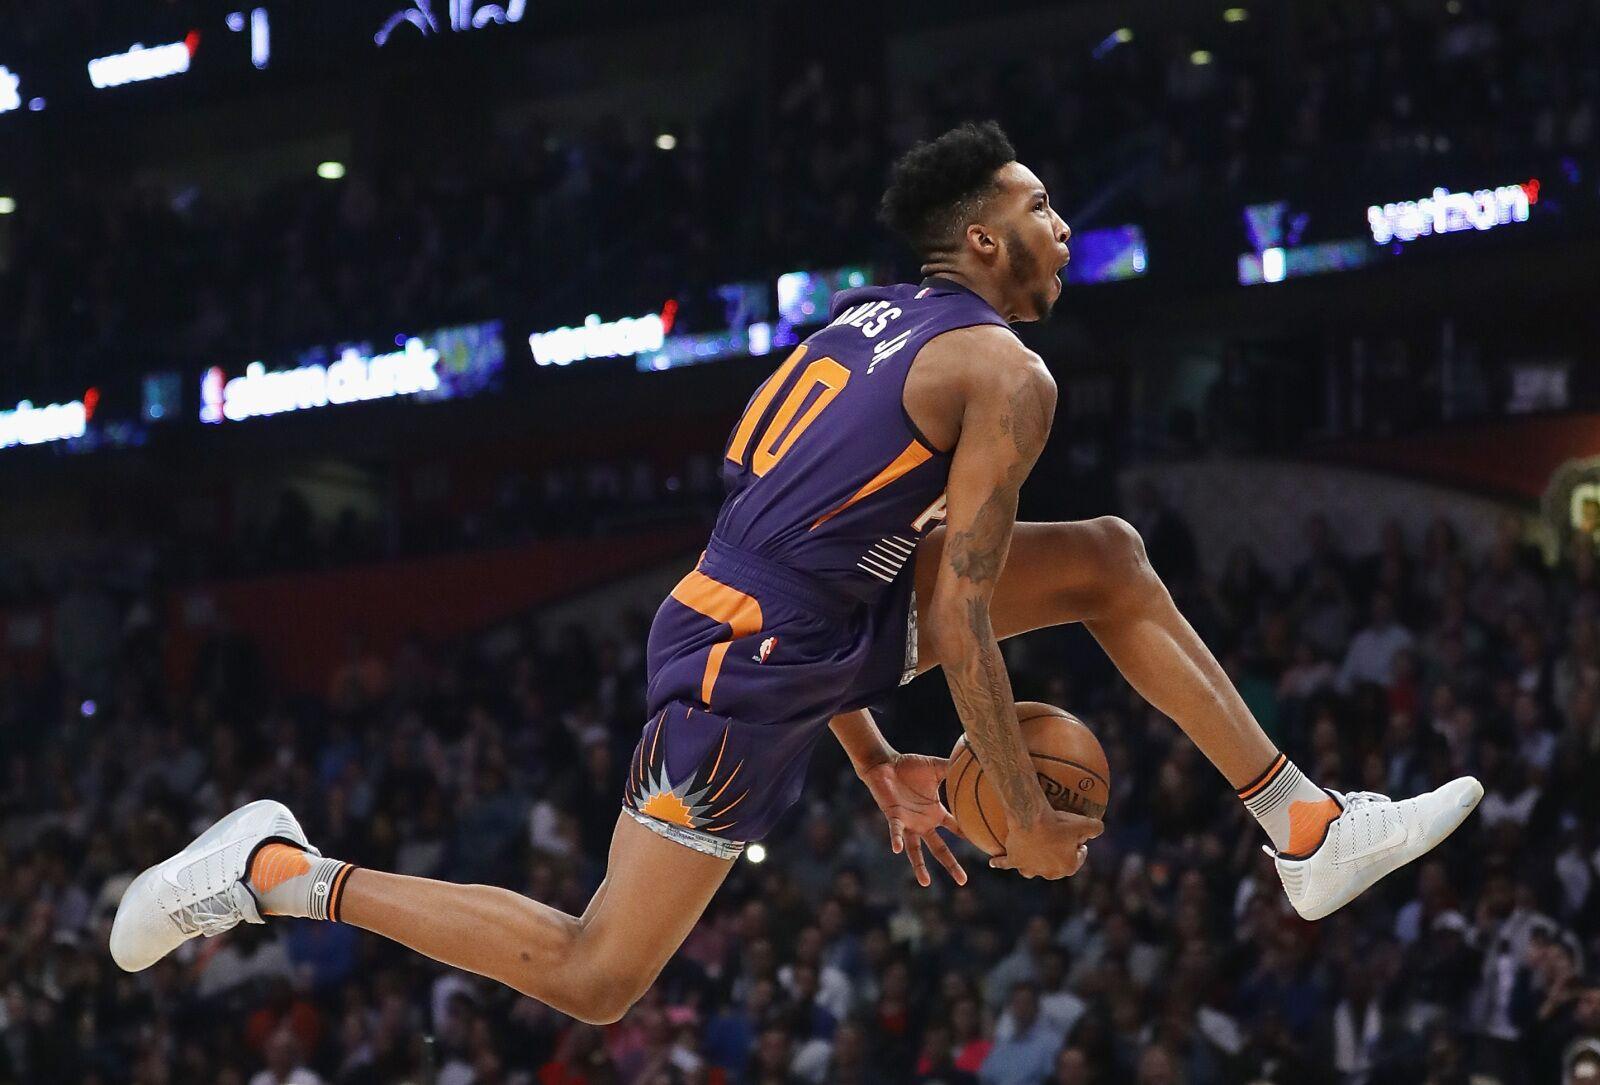 Should the Phoenix Suns have been more patient with Derrick Jones Jr.?